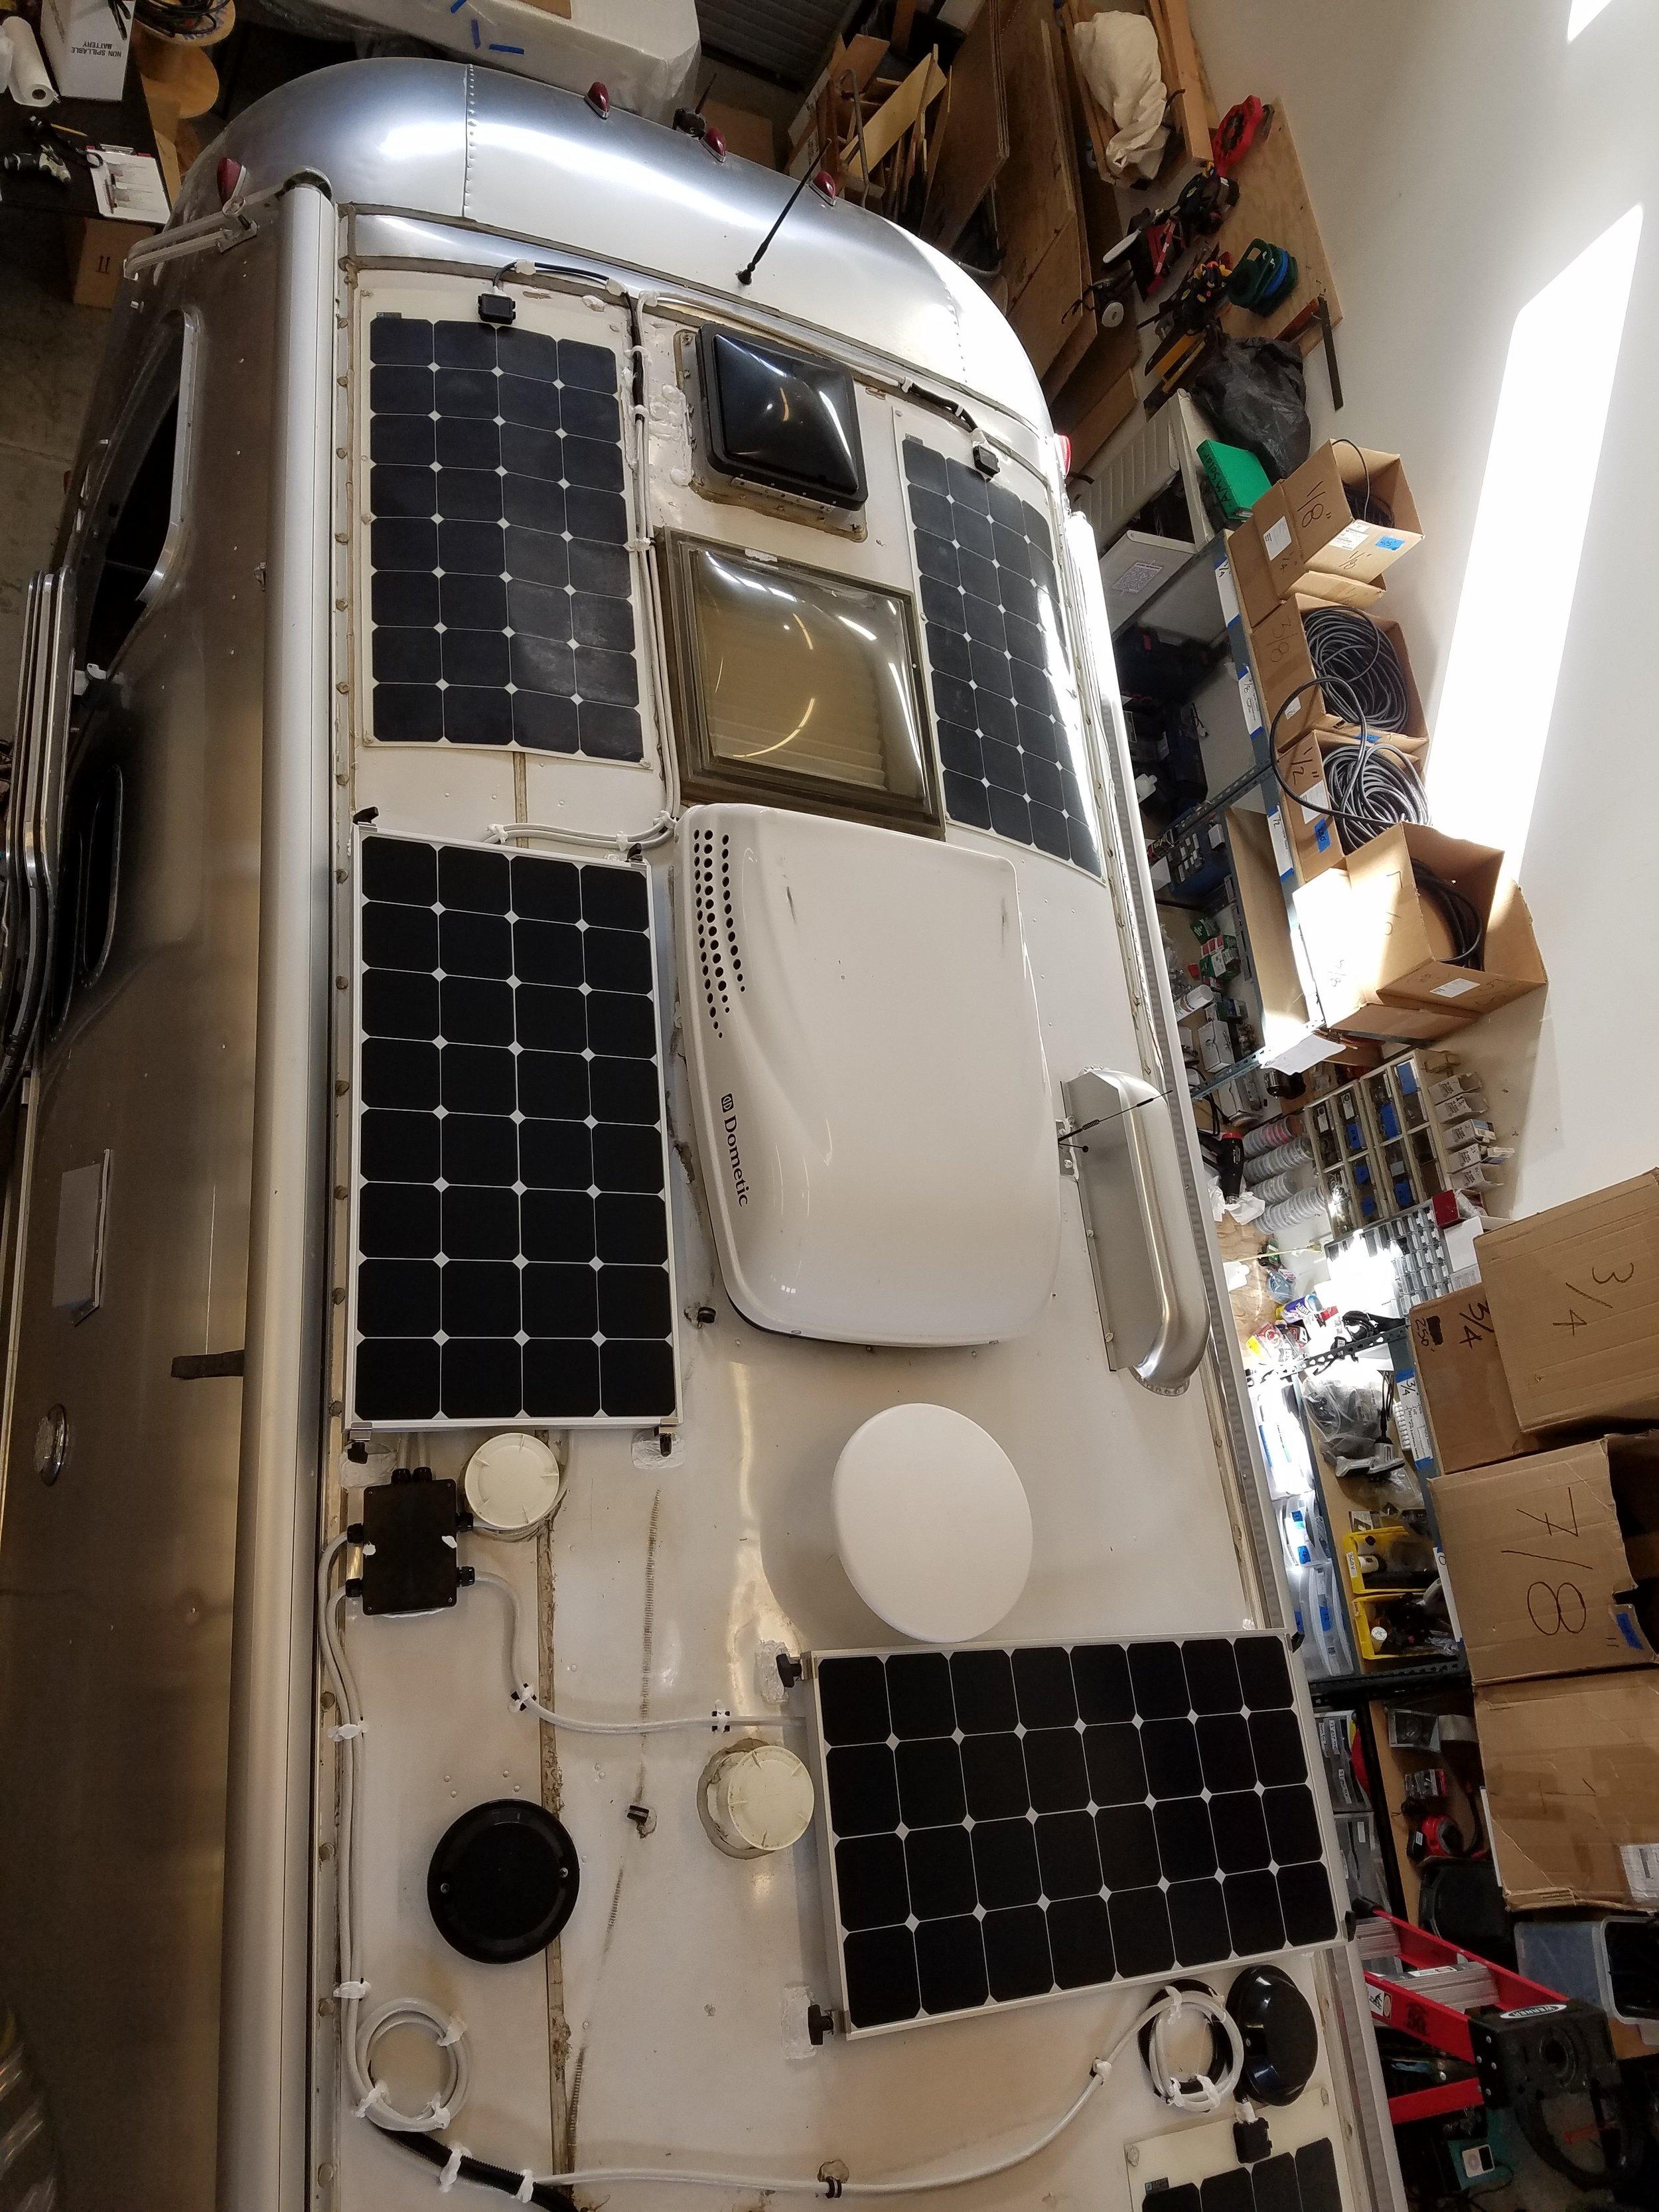 Rv Electrical Wiring Diagram Rv Solar Kits Solar Caravan And Rv Mount